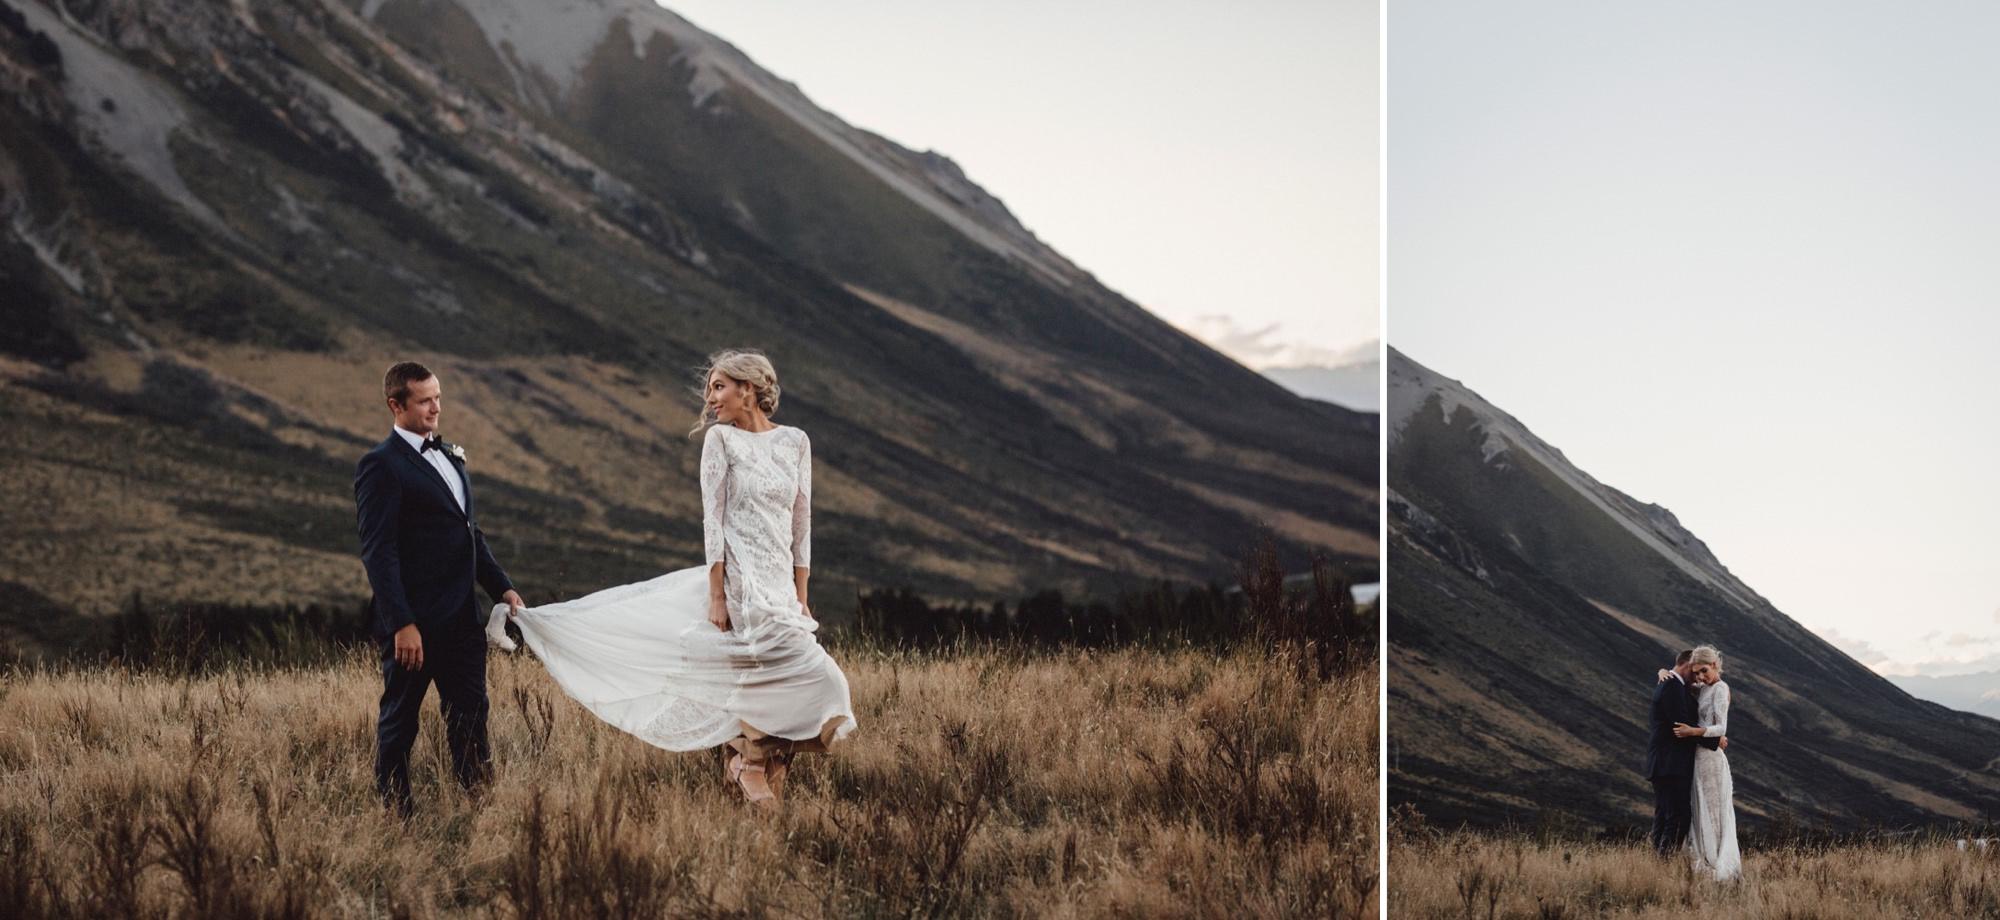 unique wedding photographer australia